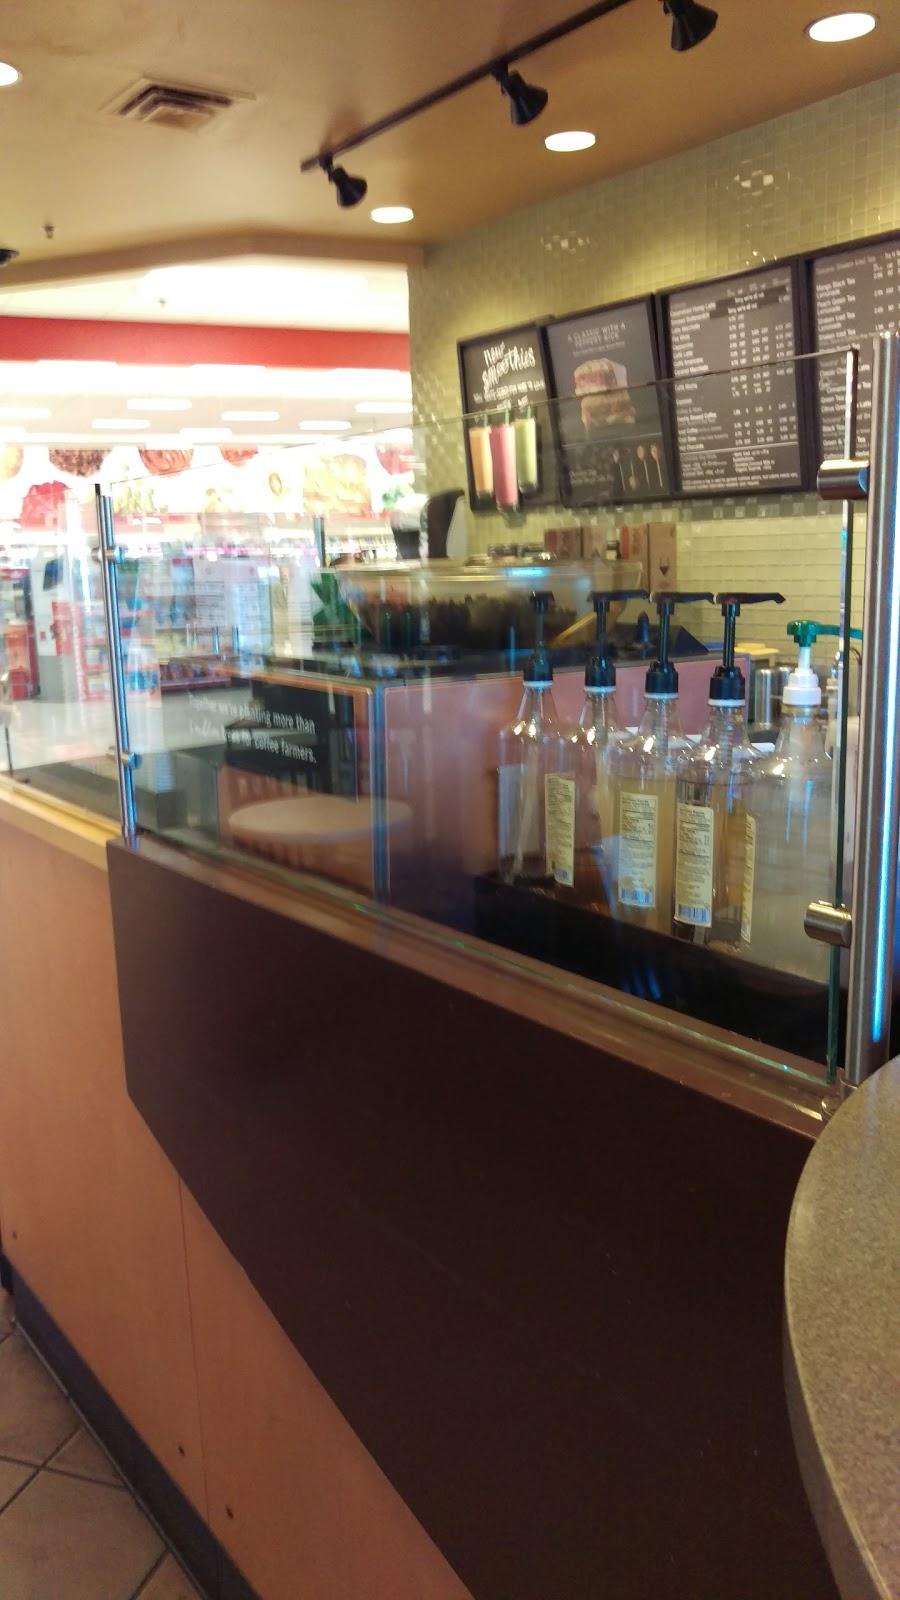 Starbucks - cafe    Photo 10 of 10   Address: 4884 Eldorado Pkwy, Frisco, TX 75034, USA   Phone: (972) 464-5745